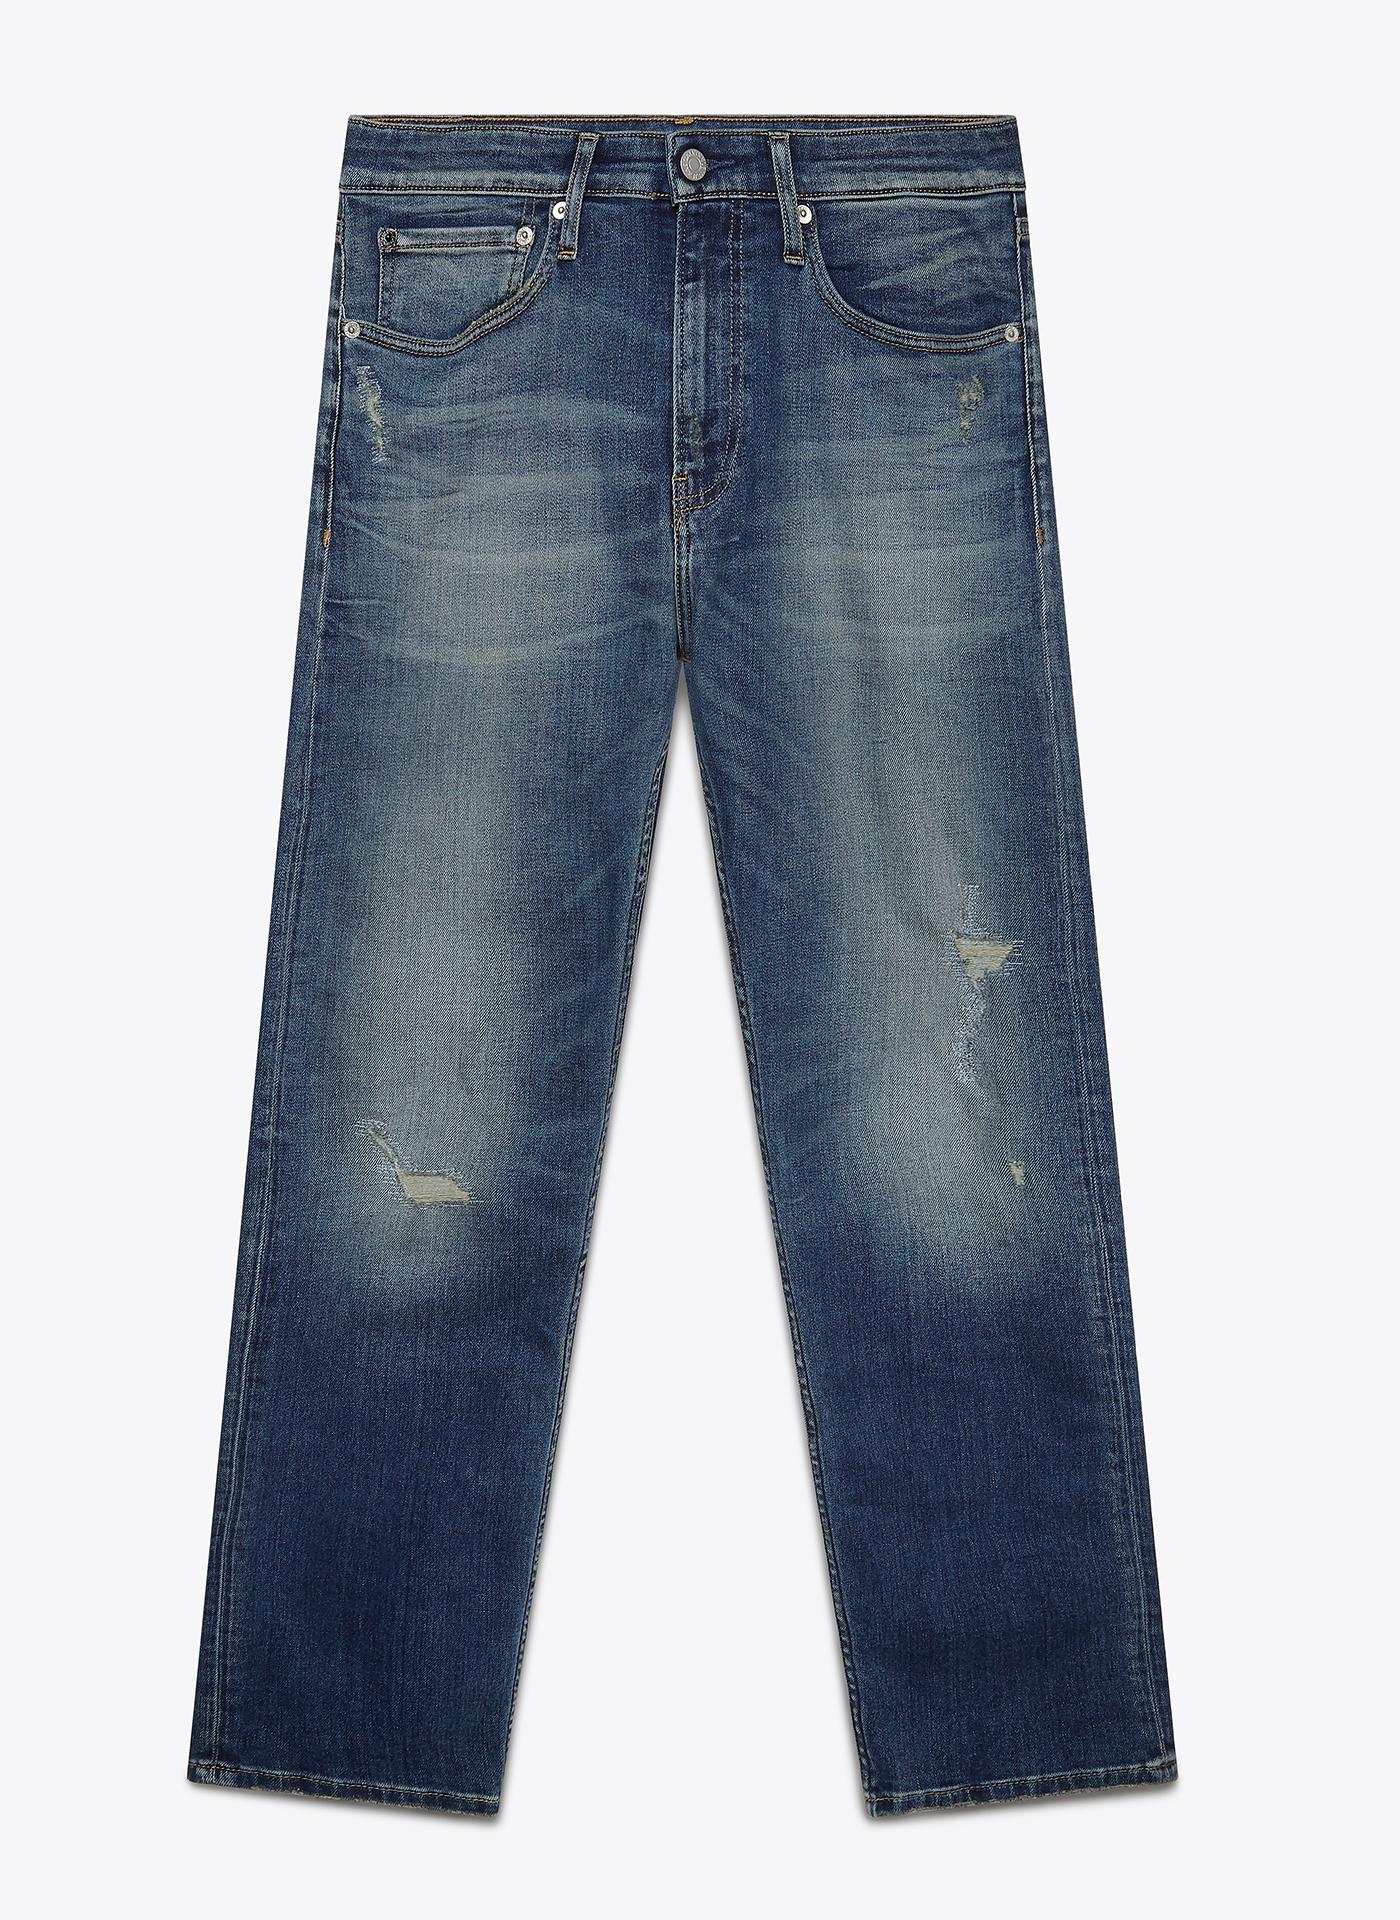 blue denim jeans front on white background